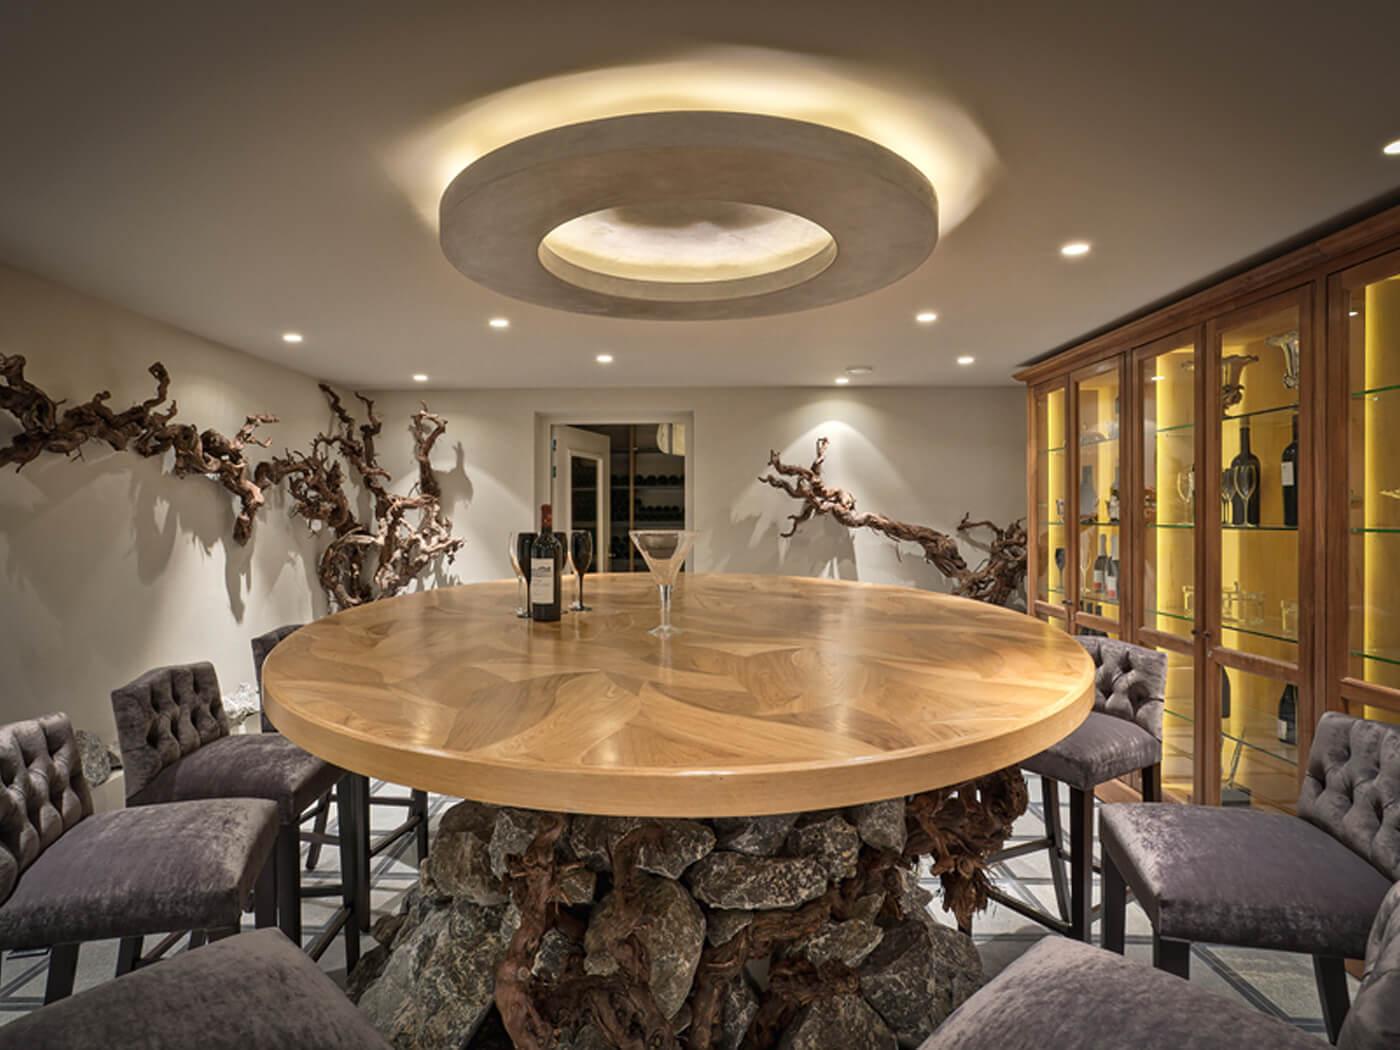 Horeca interieurdesign Kasteel Withof